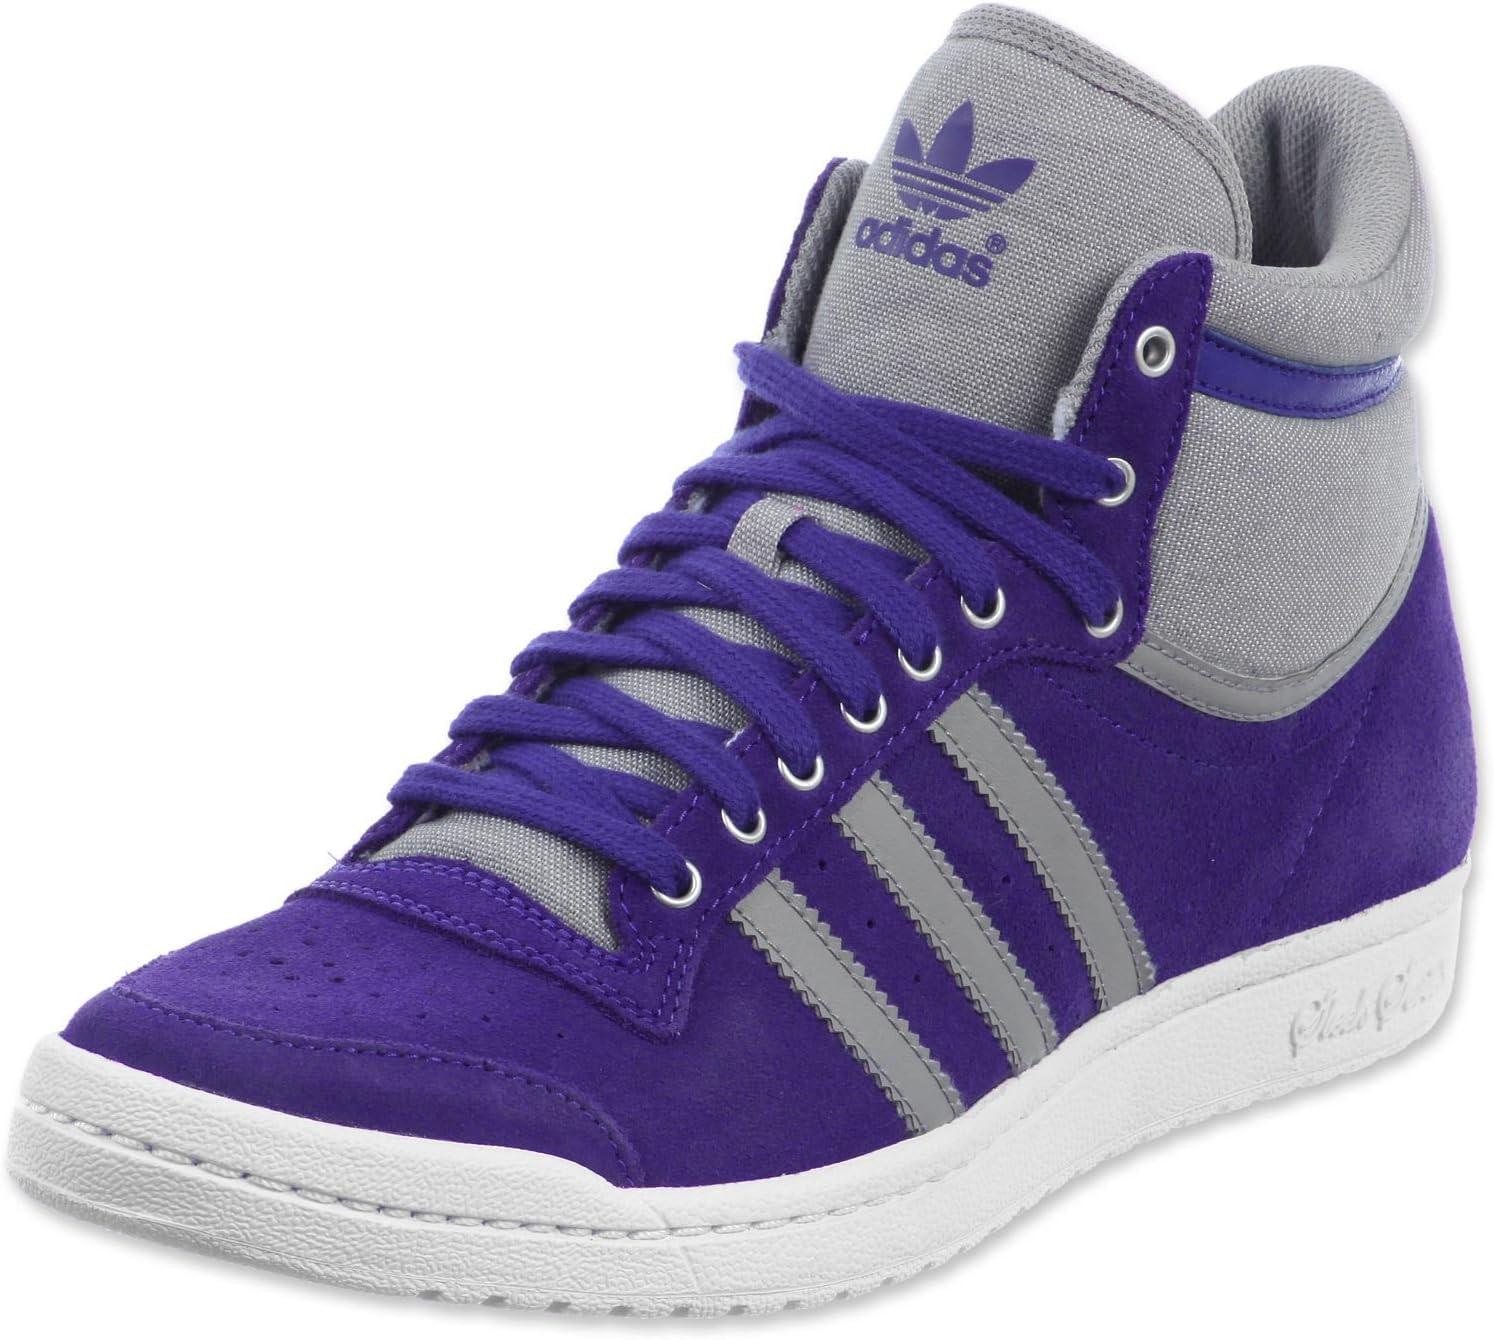 adidas Originals Top Ten Hi Sleek Purple G95447 purple Size